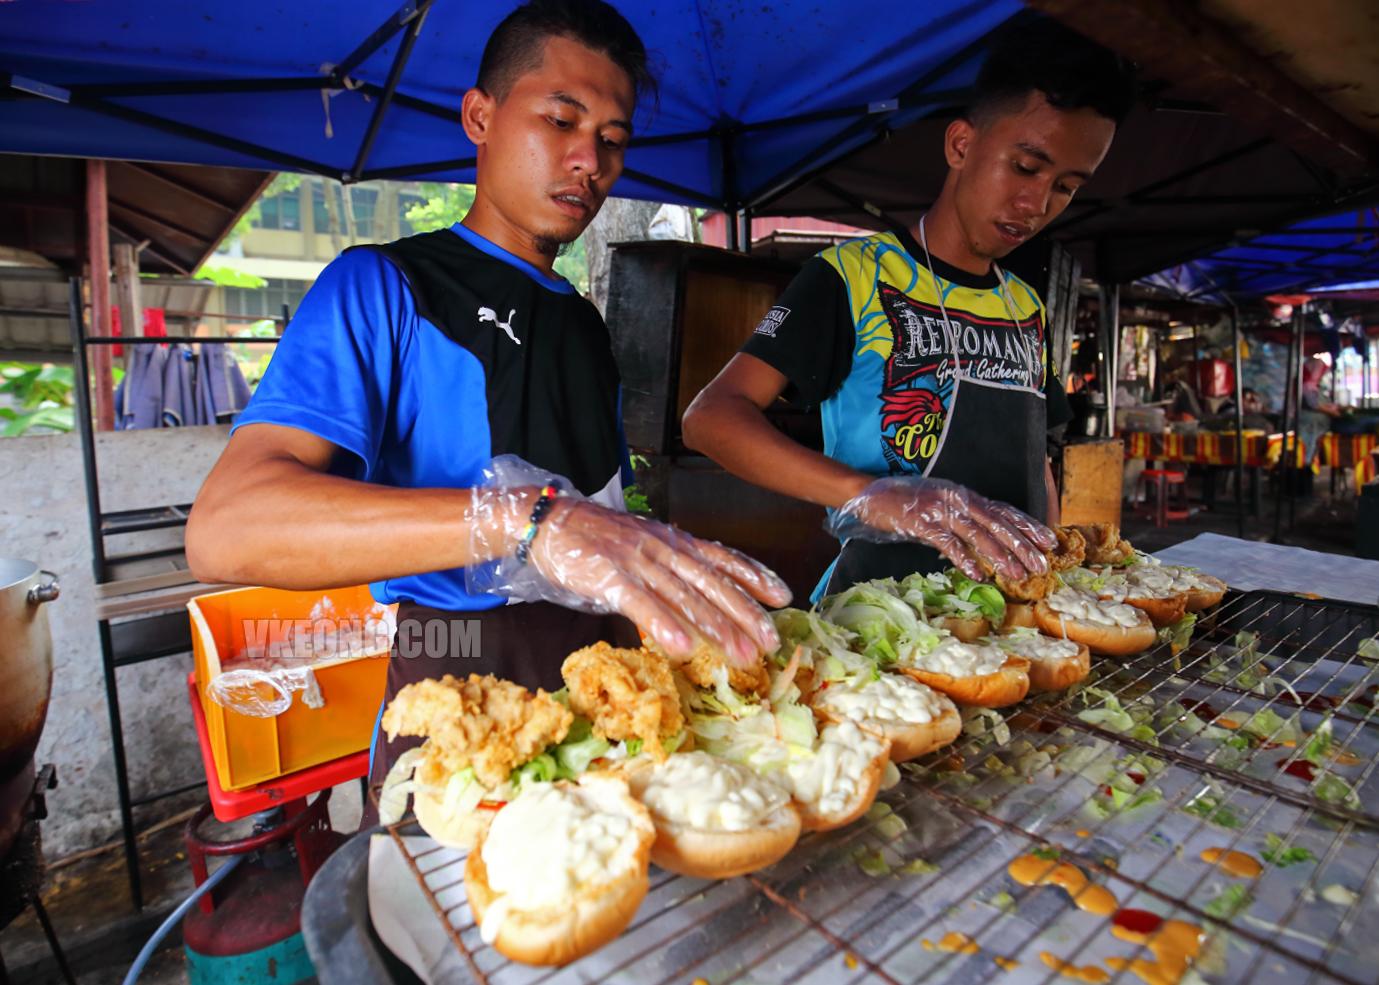 Stylish-Burger-PJ-RM3-Burgers